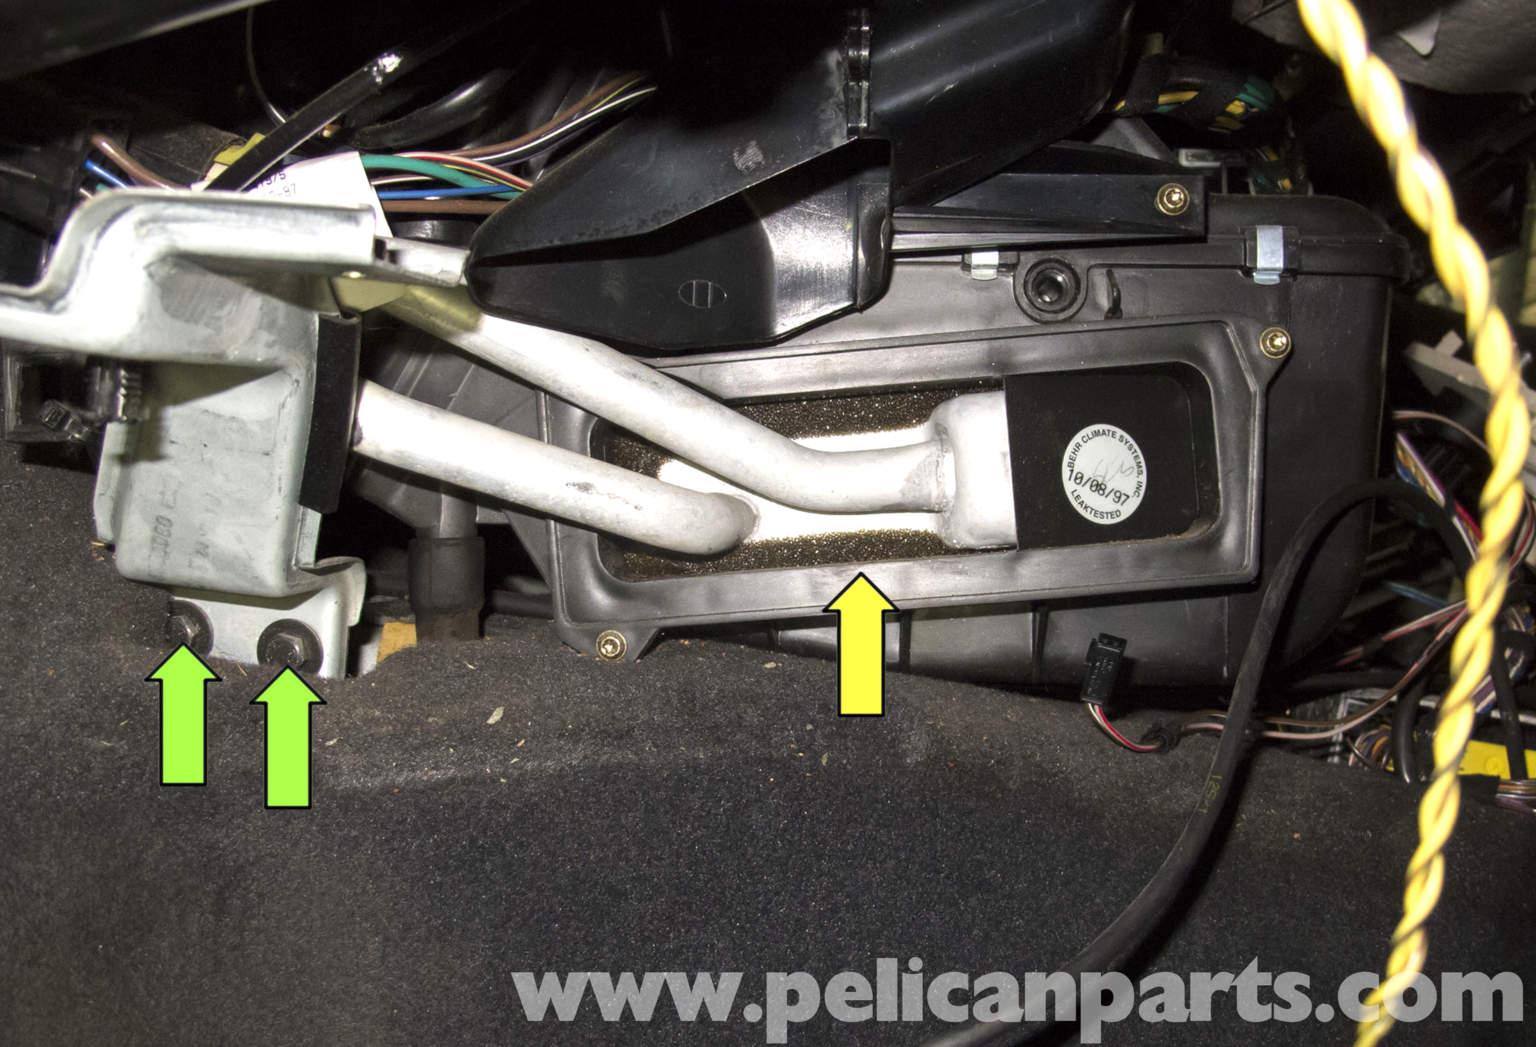 Pelican Technical Article